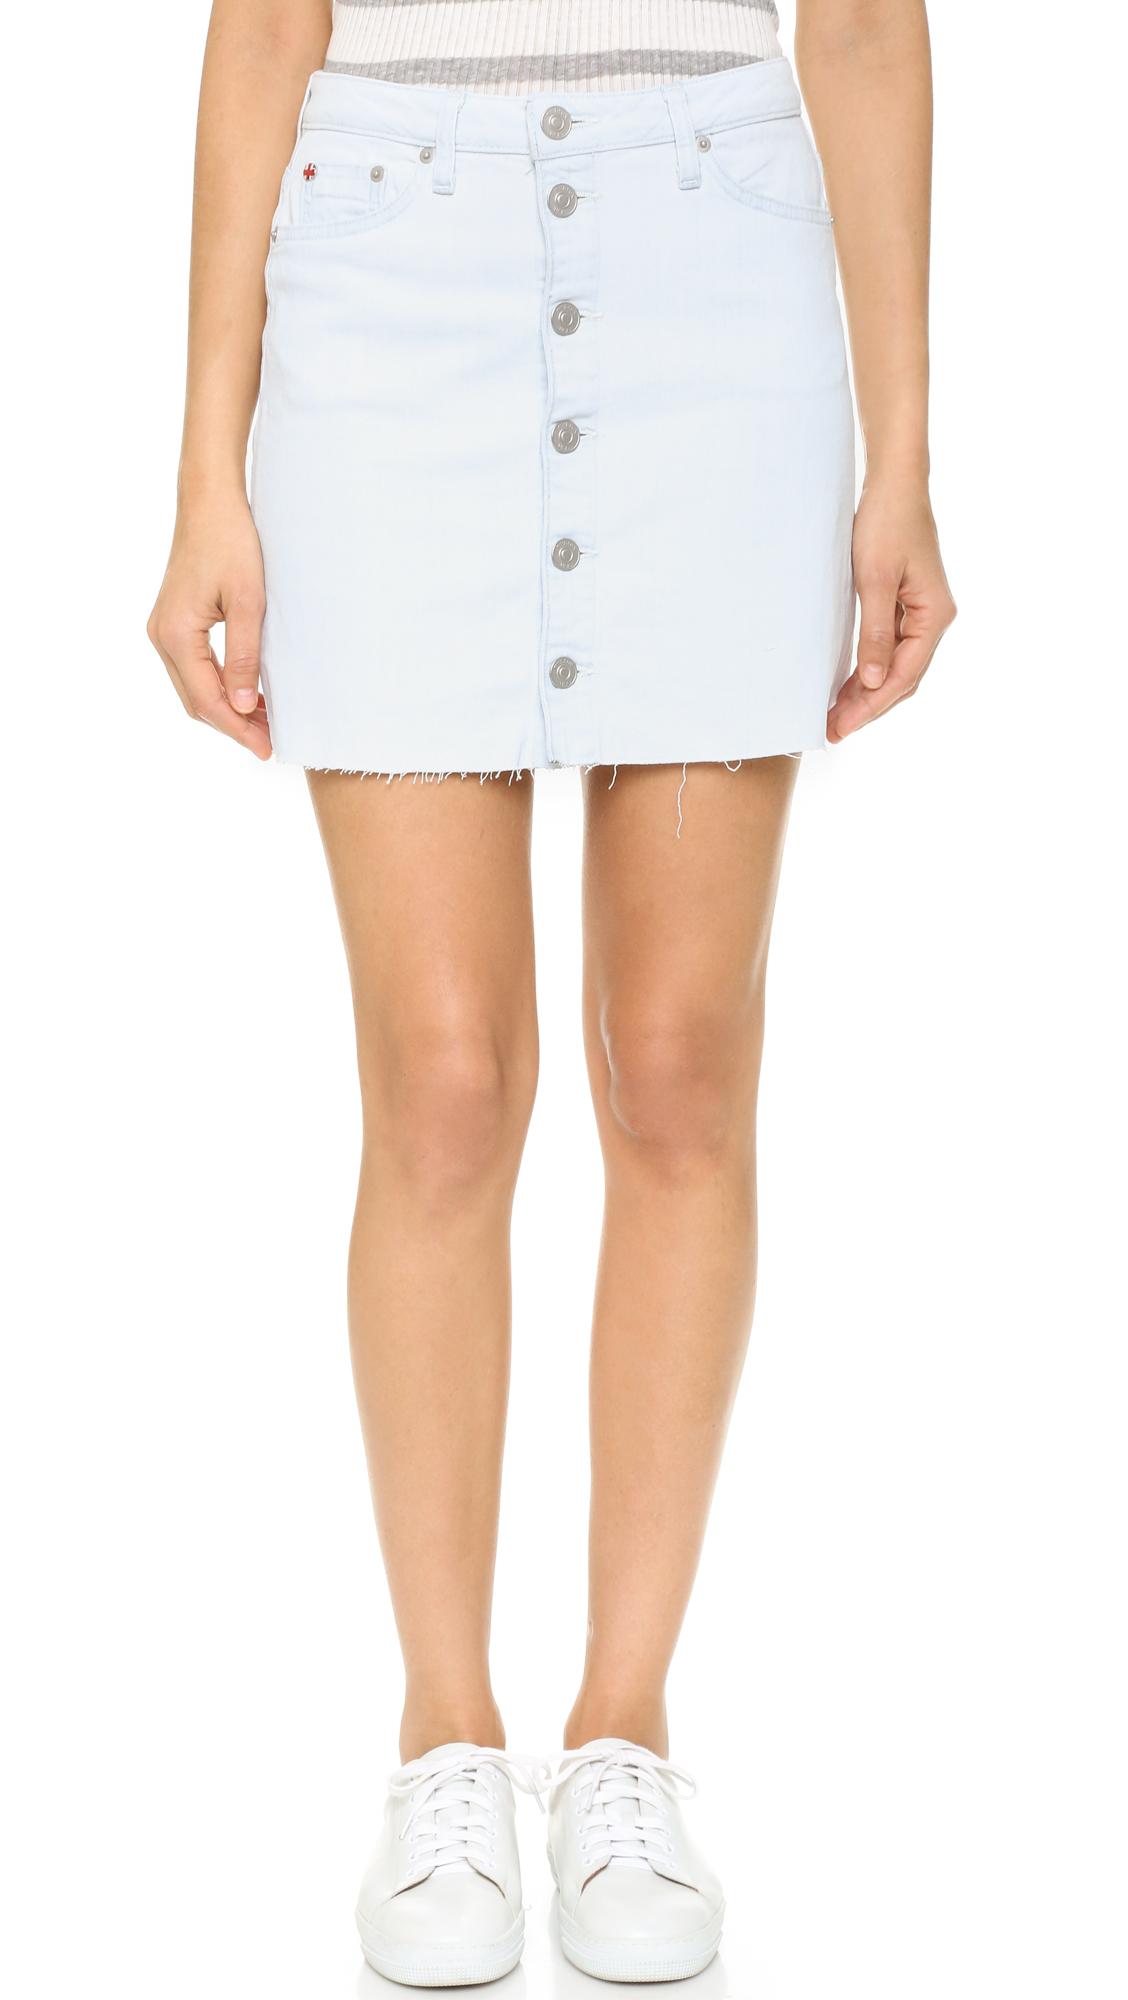 Hudson Cammy Button Up Skirt - Seaside at Shopbop